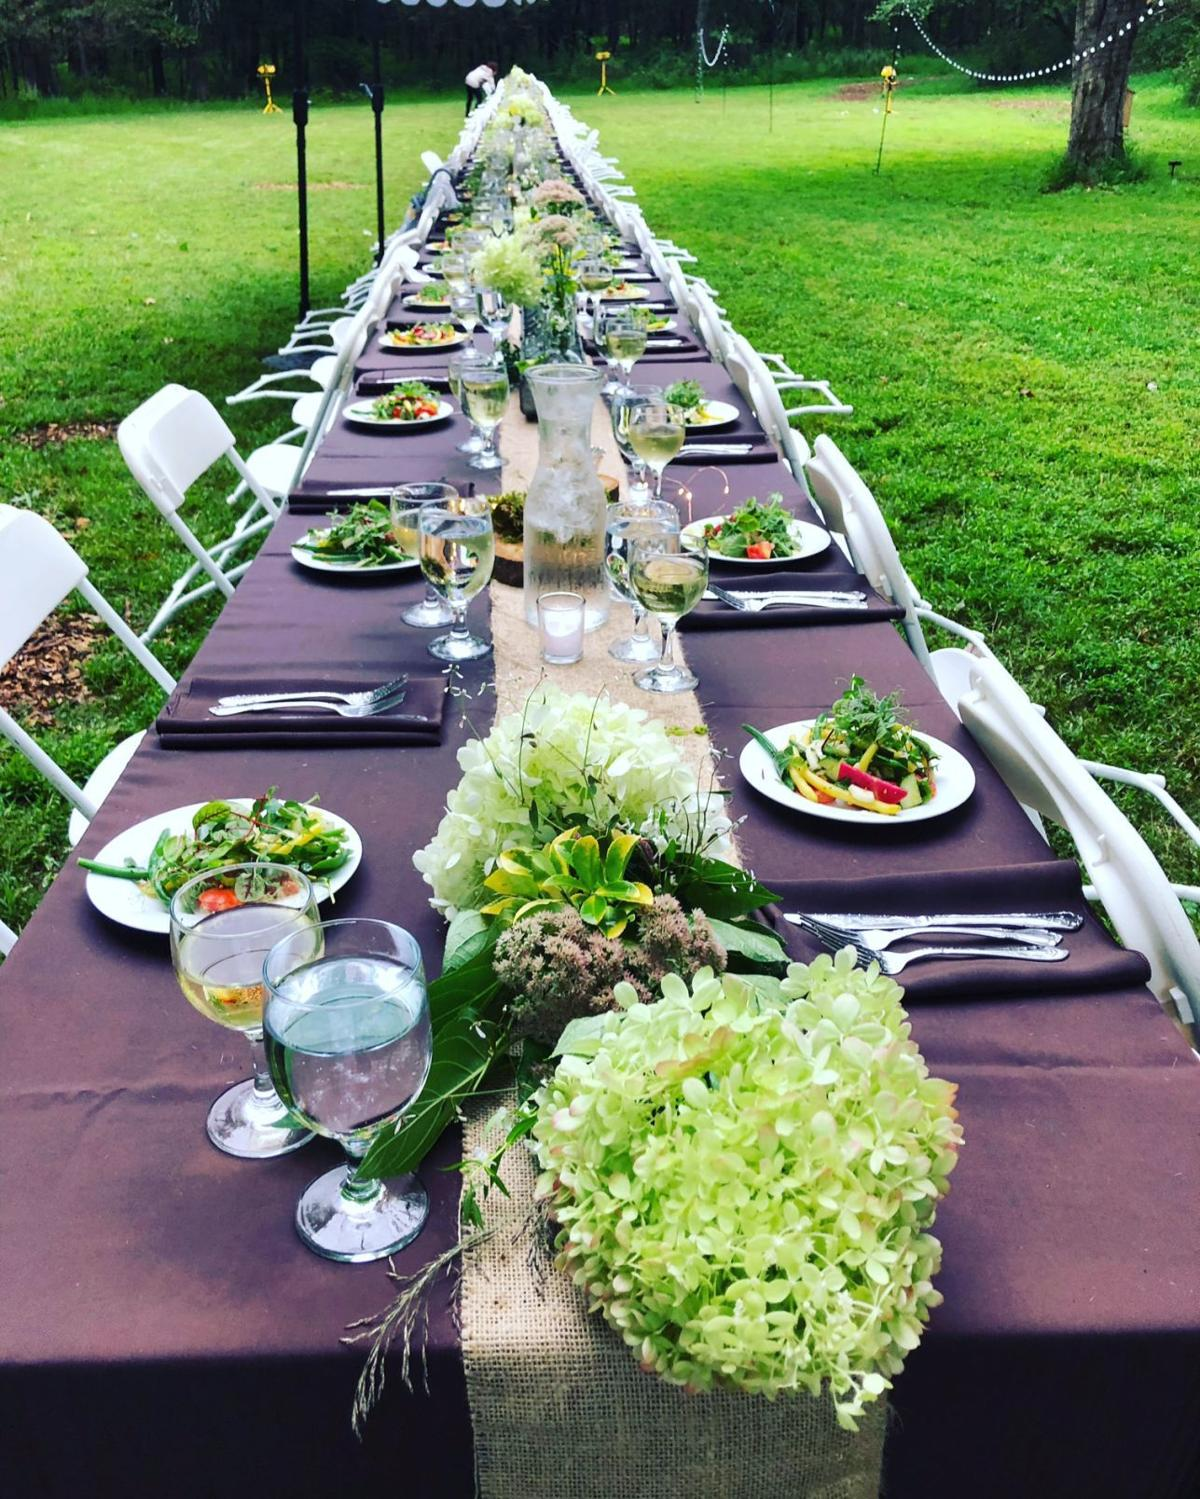 Tewksbury's Whittemore holds 1st annual Garden to Table dinner